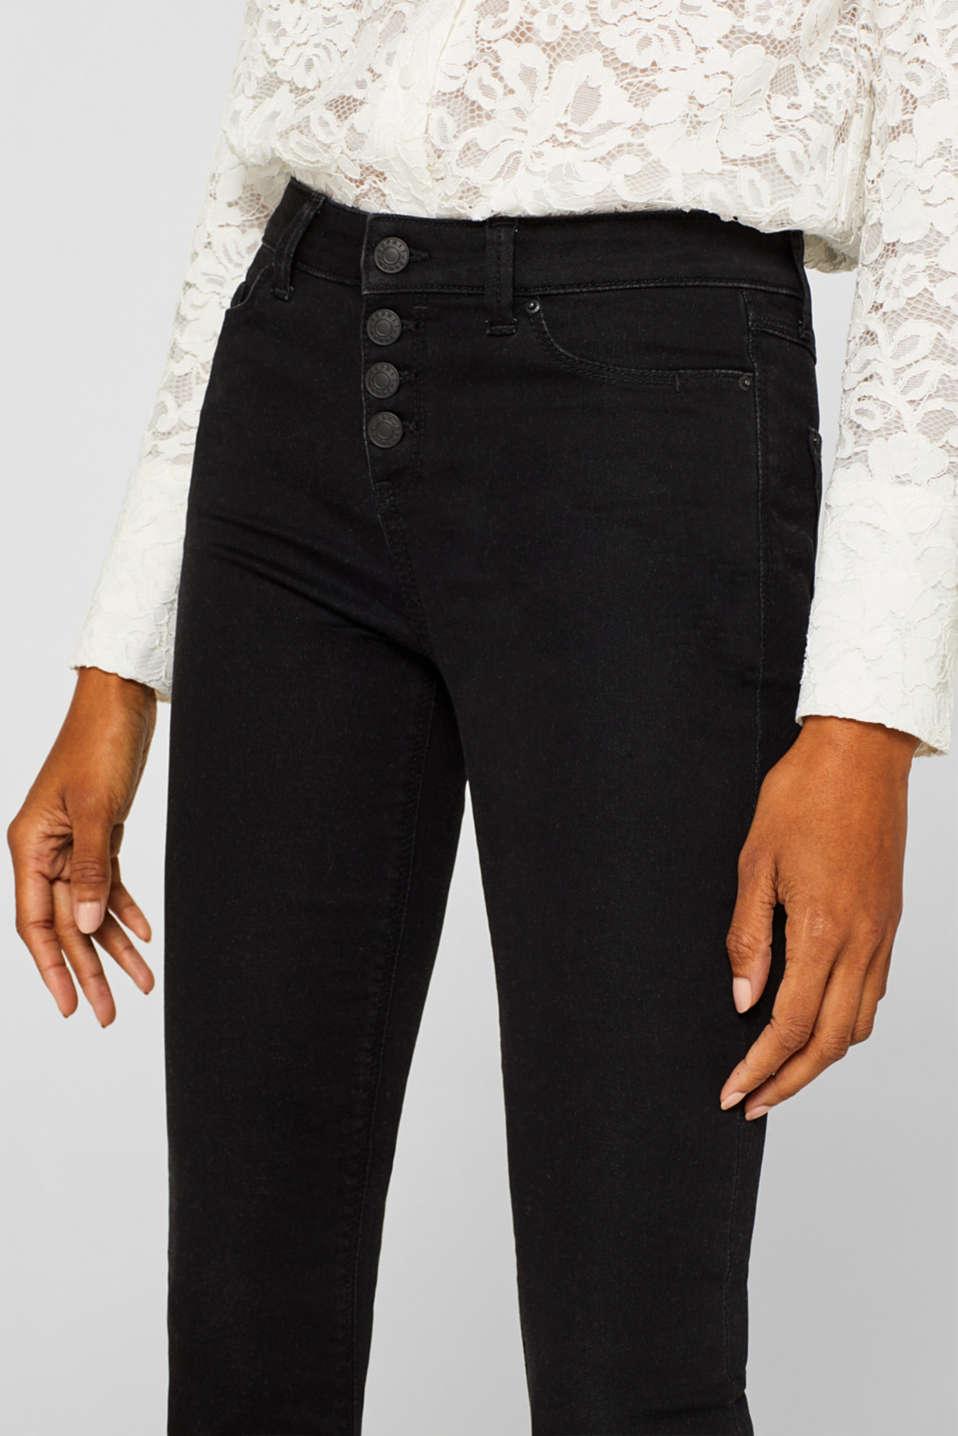 Pants denim, BLACK DARK WASH, detail image number 2